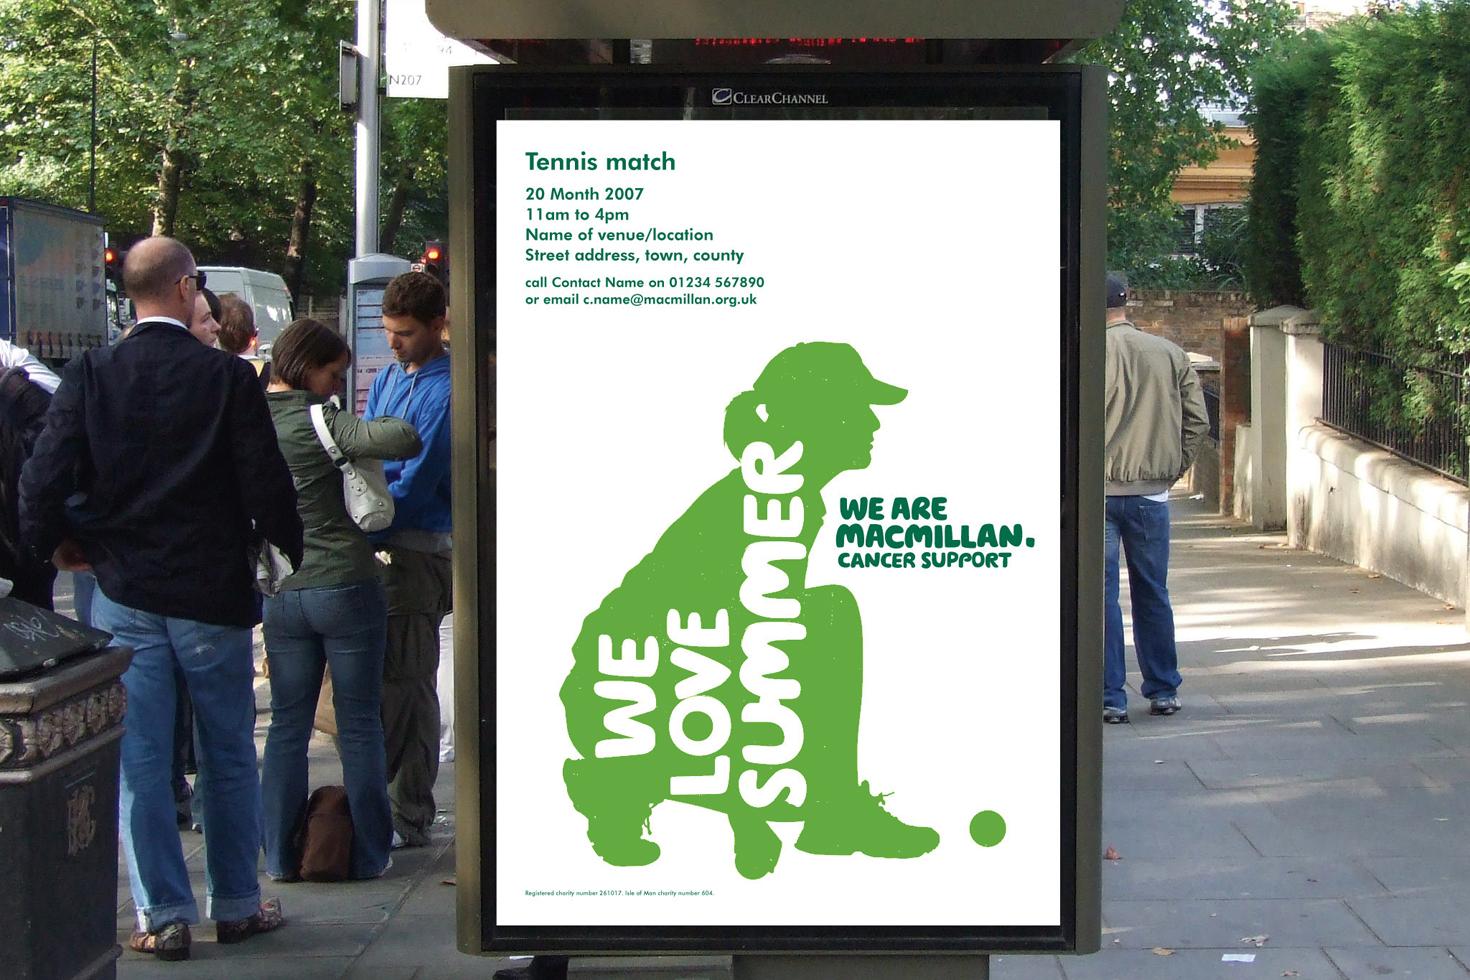 Macmillan Cancer Support billboard